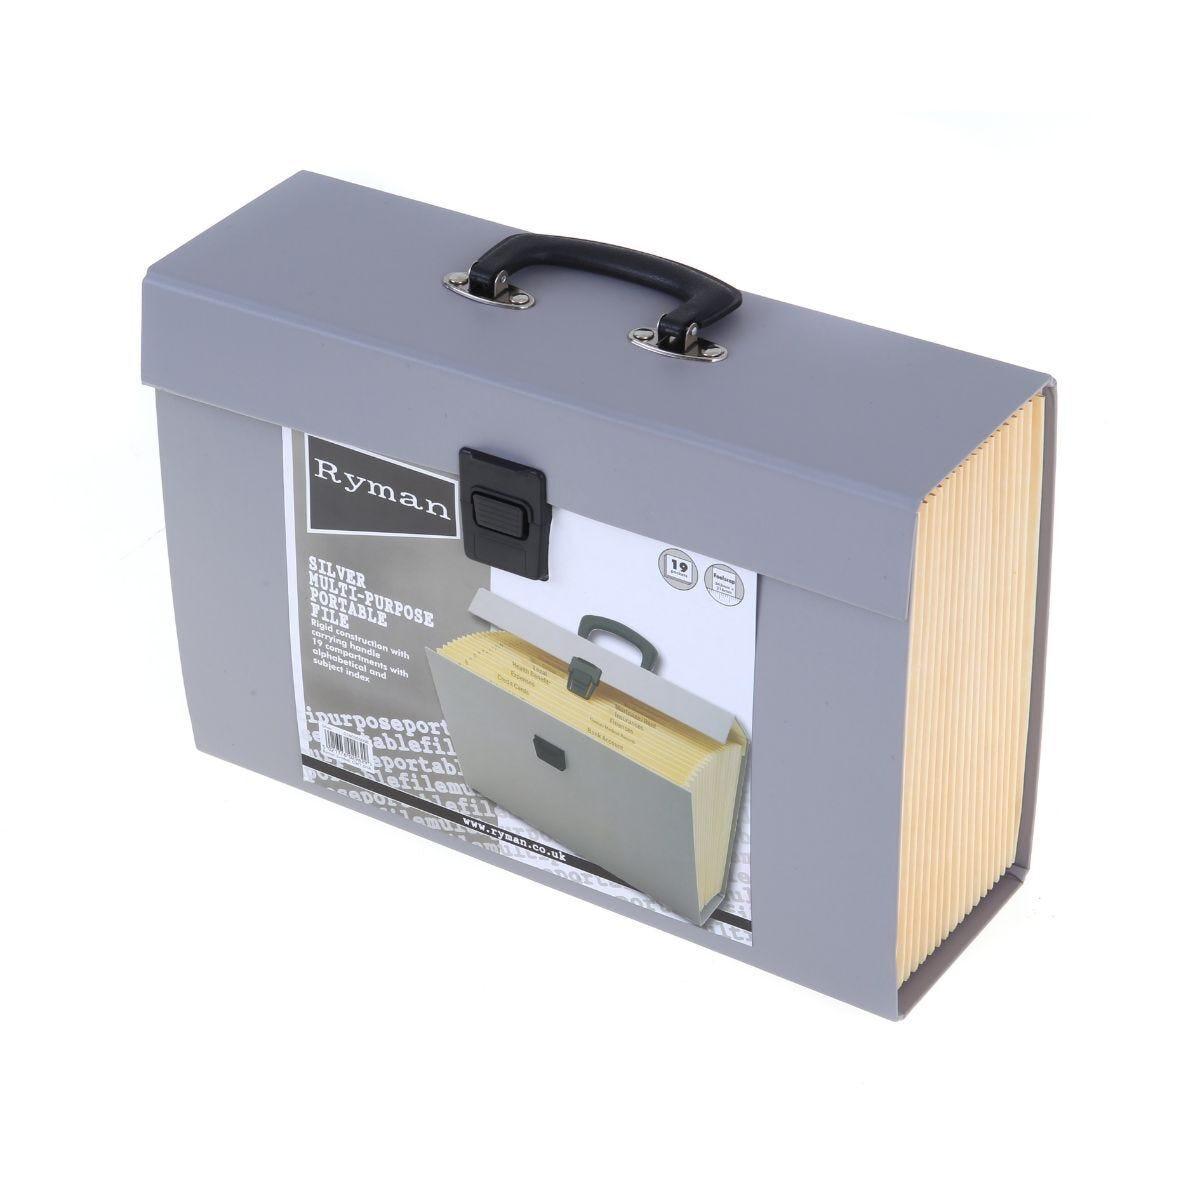 Ryman 19 Pocket Expandable File